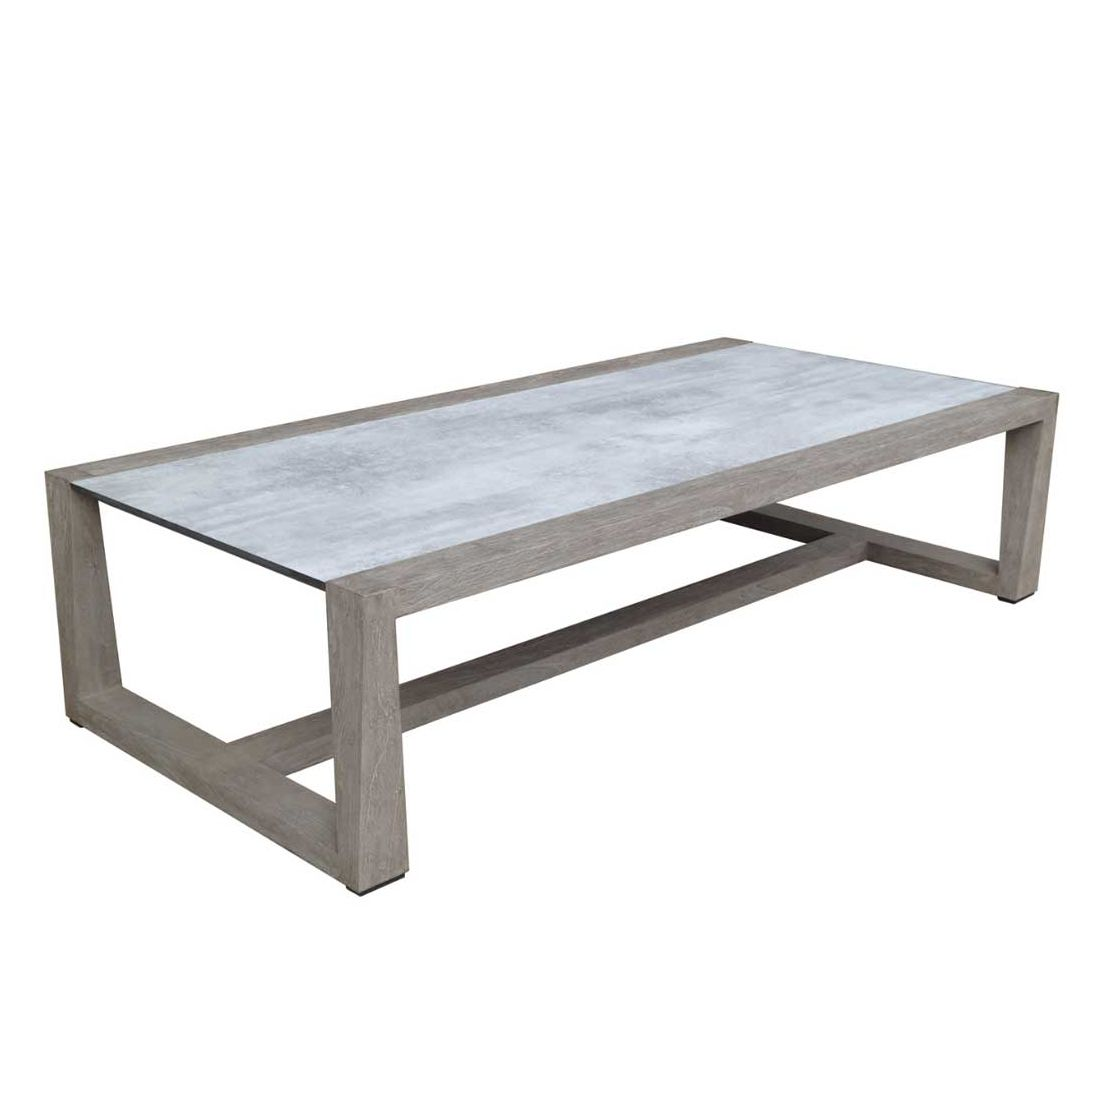 table basse rectangulaire skaal les jardins